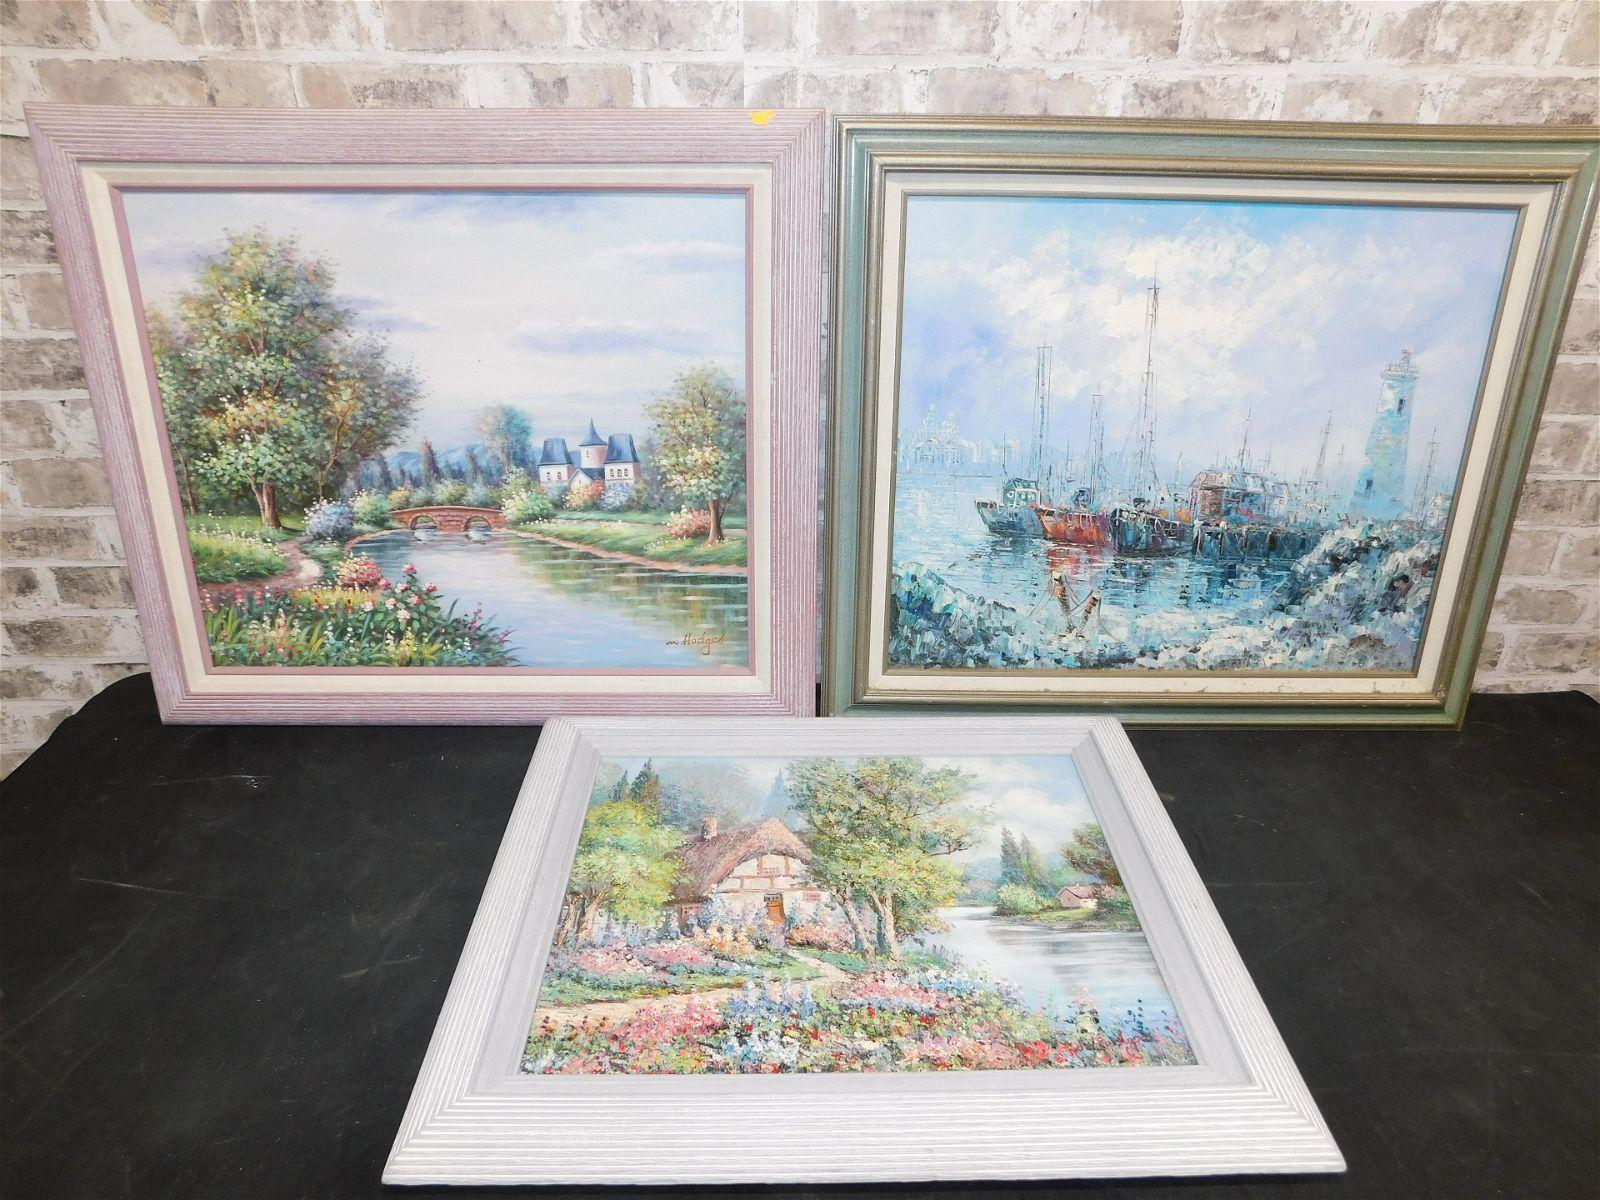 Lot of 3 Framed Oil on Canvas